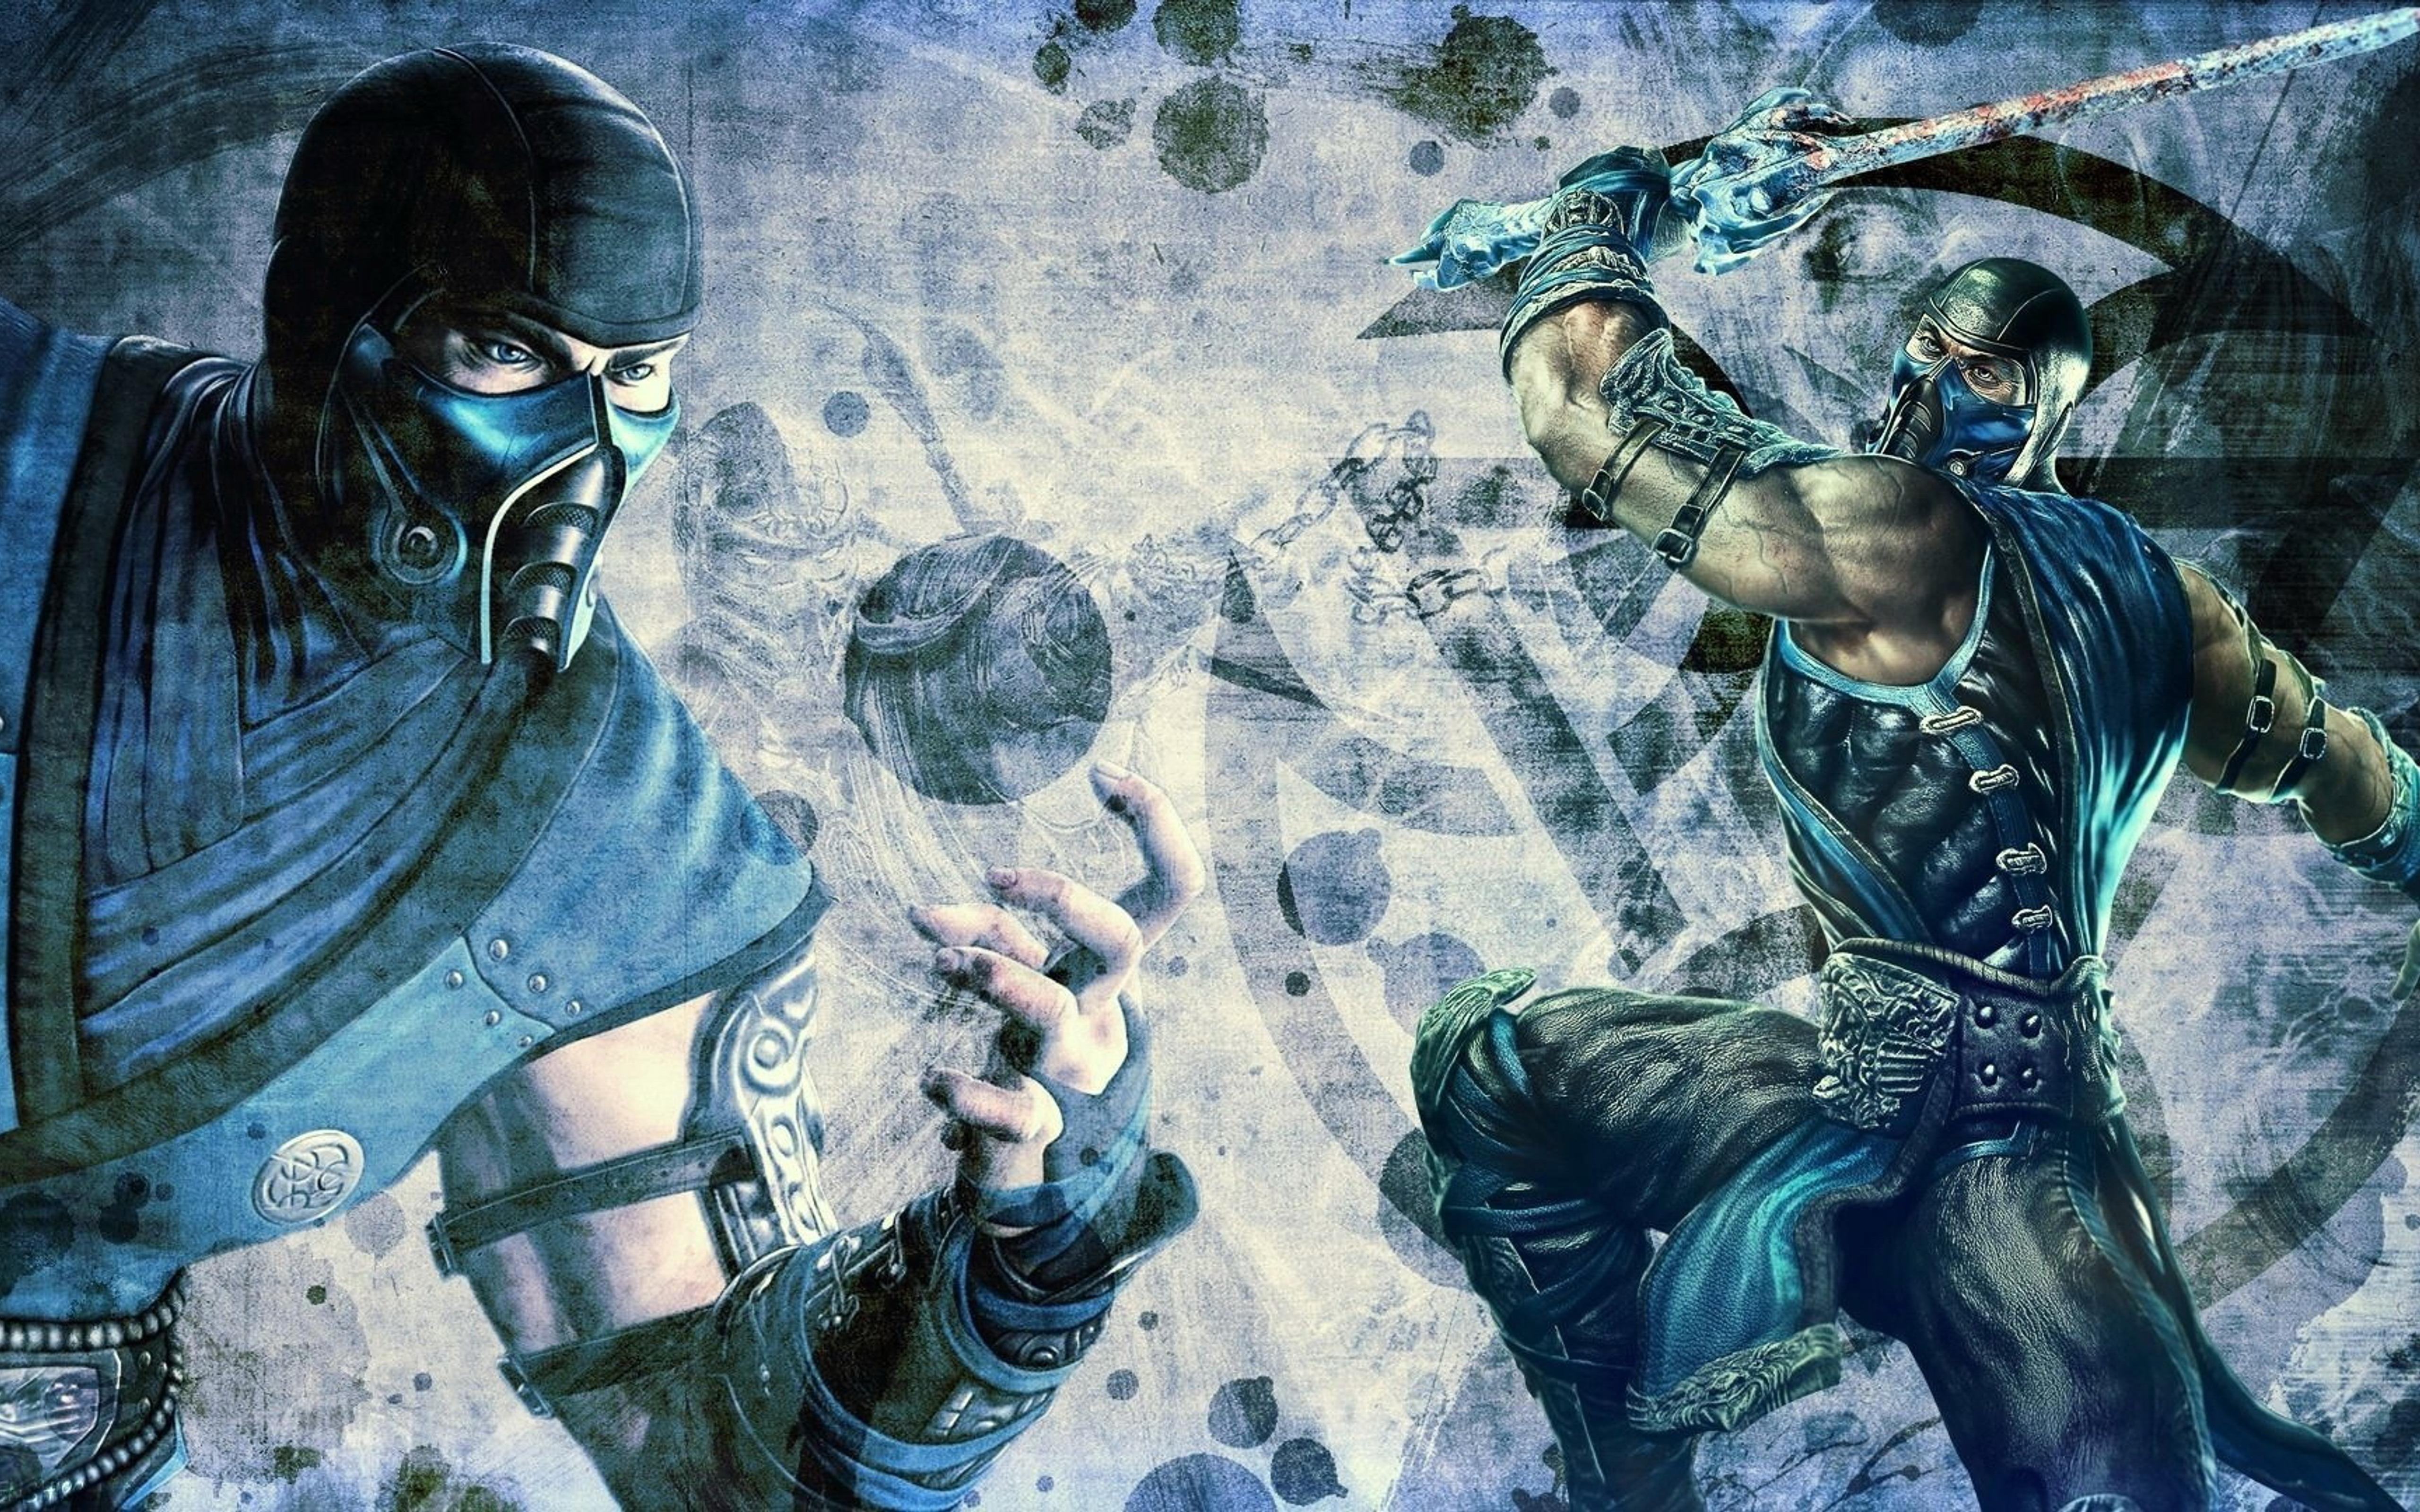 Download Wallpaper 5120x3200 Subzero From Mortal Kombat